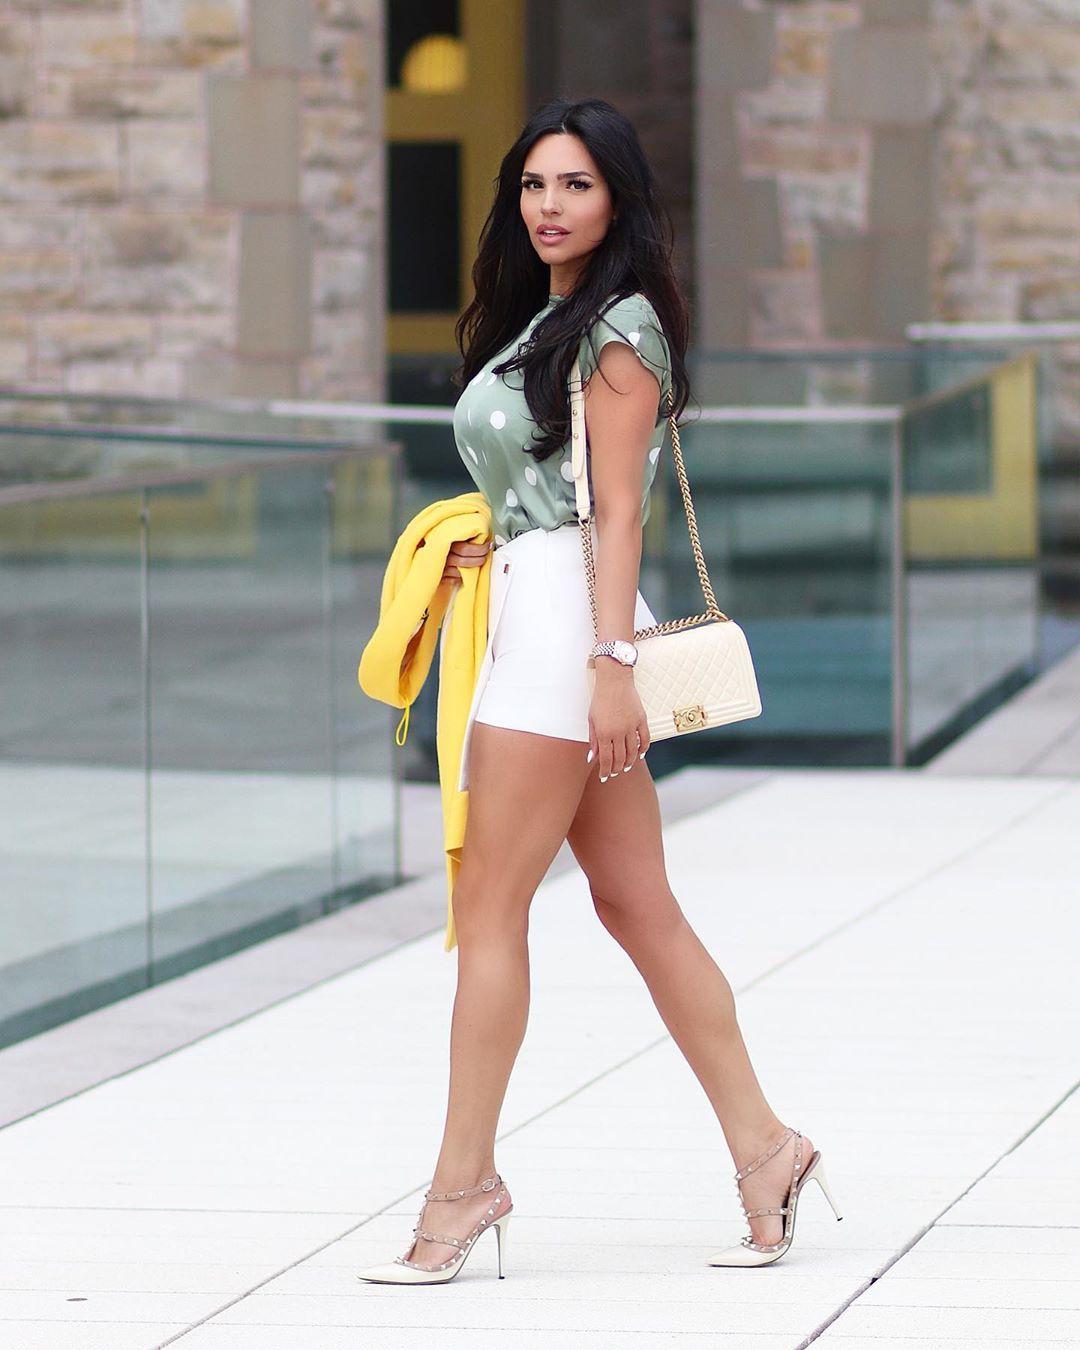 Shadi Y Cair hot legs, hot legs picture, costumes designs